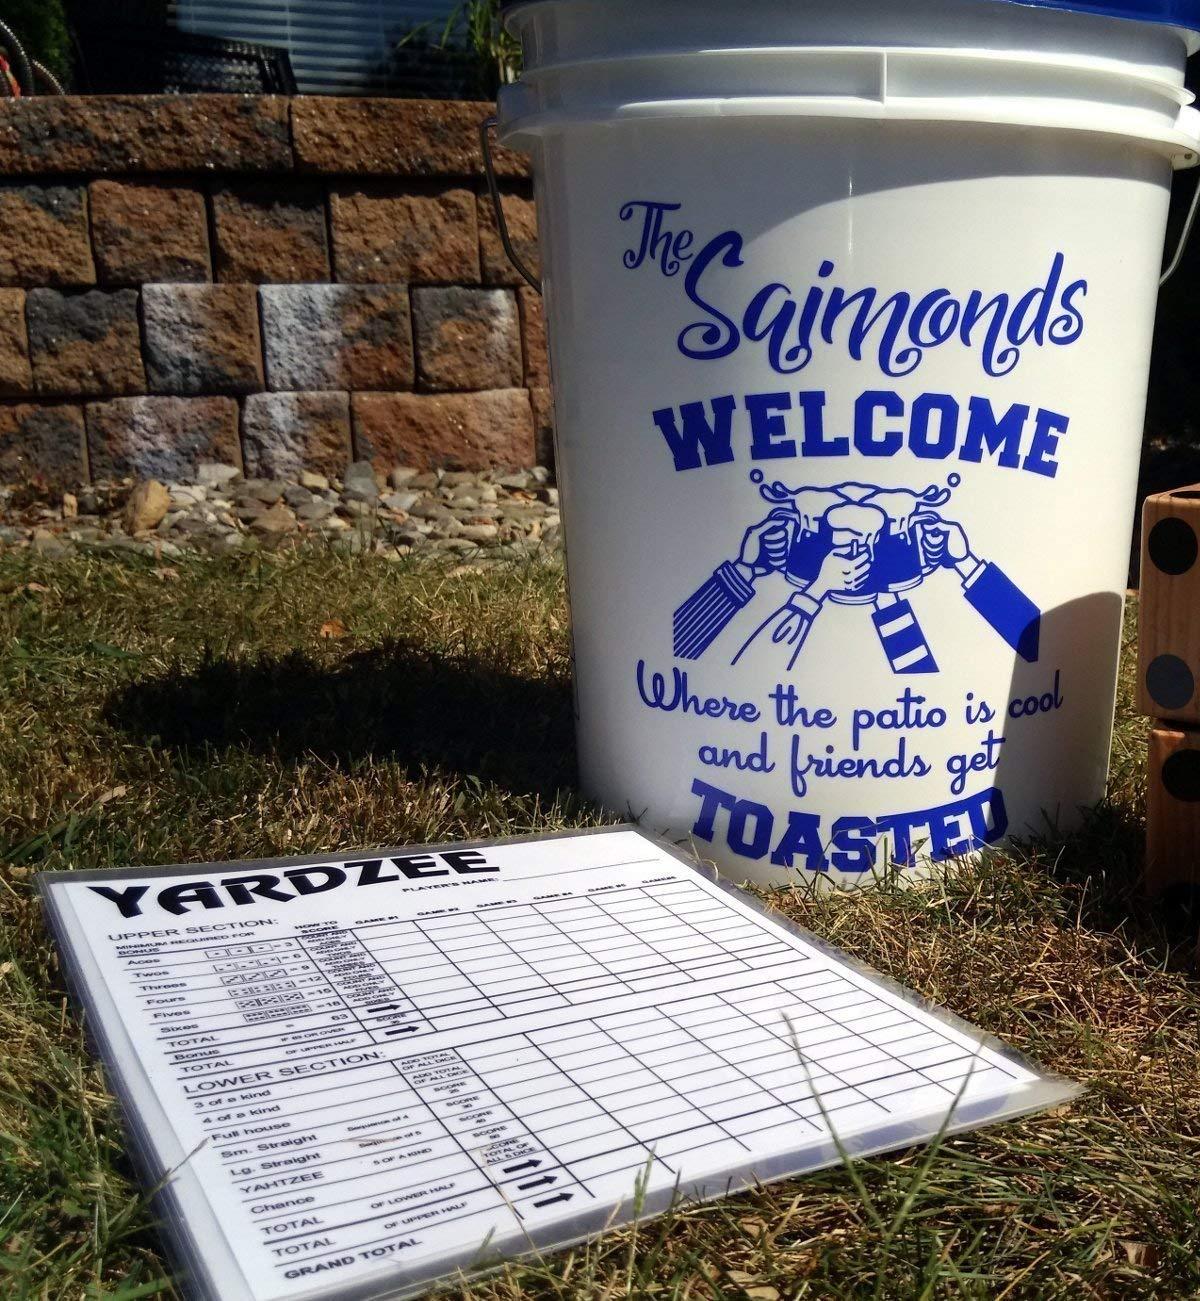 Personalized YARDZEE Bucket Decal & Laminated Scorecards Outdoor Lawn Yard Dice Farkle Game Gift